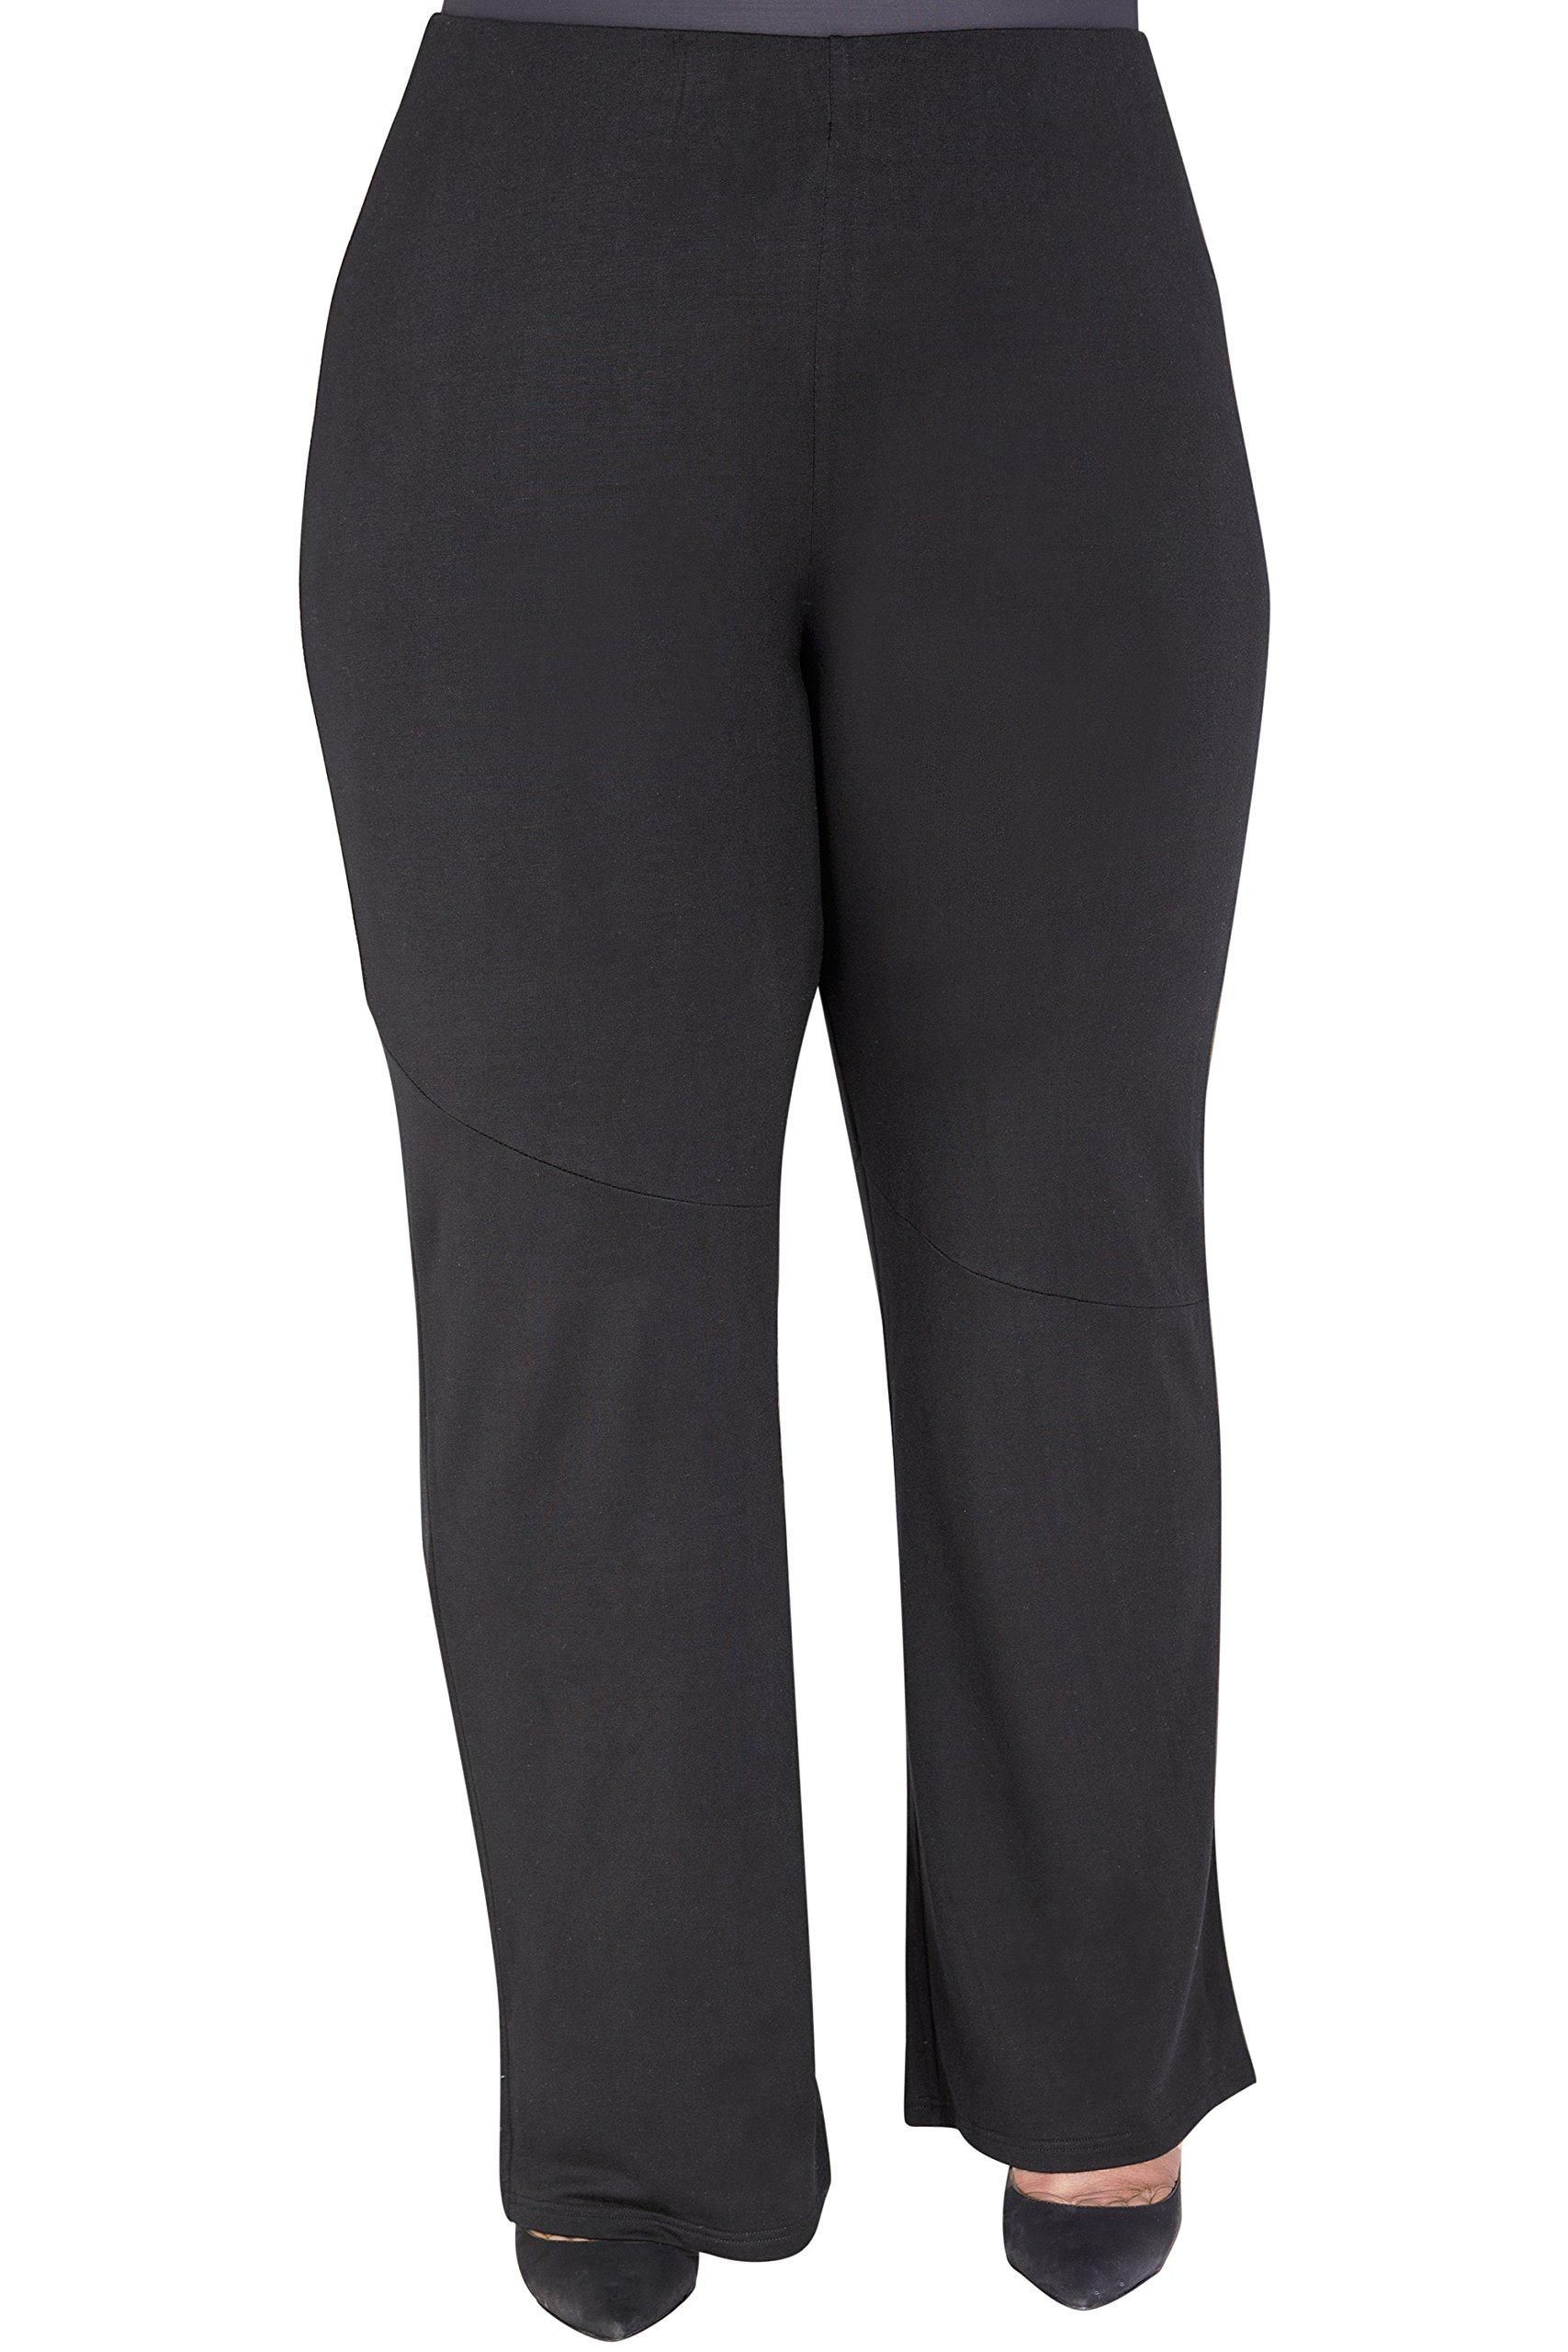 Poetic Justice Plus Size Curvy Fit Women's Wide-Leg Stretch Palazzo Pants Black Size 2X